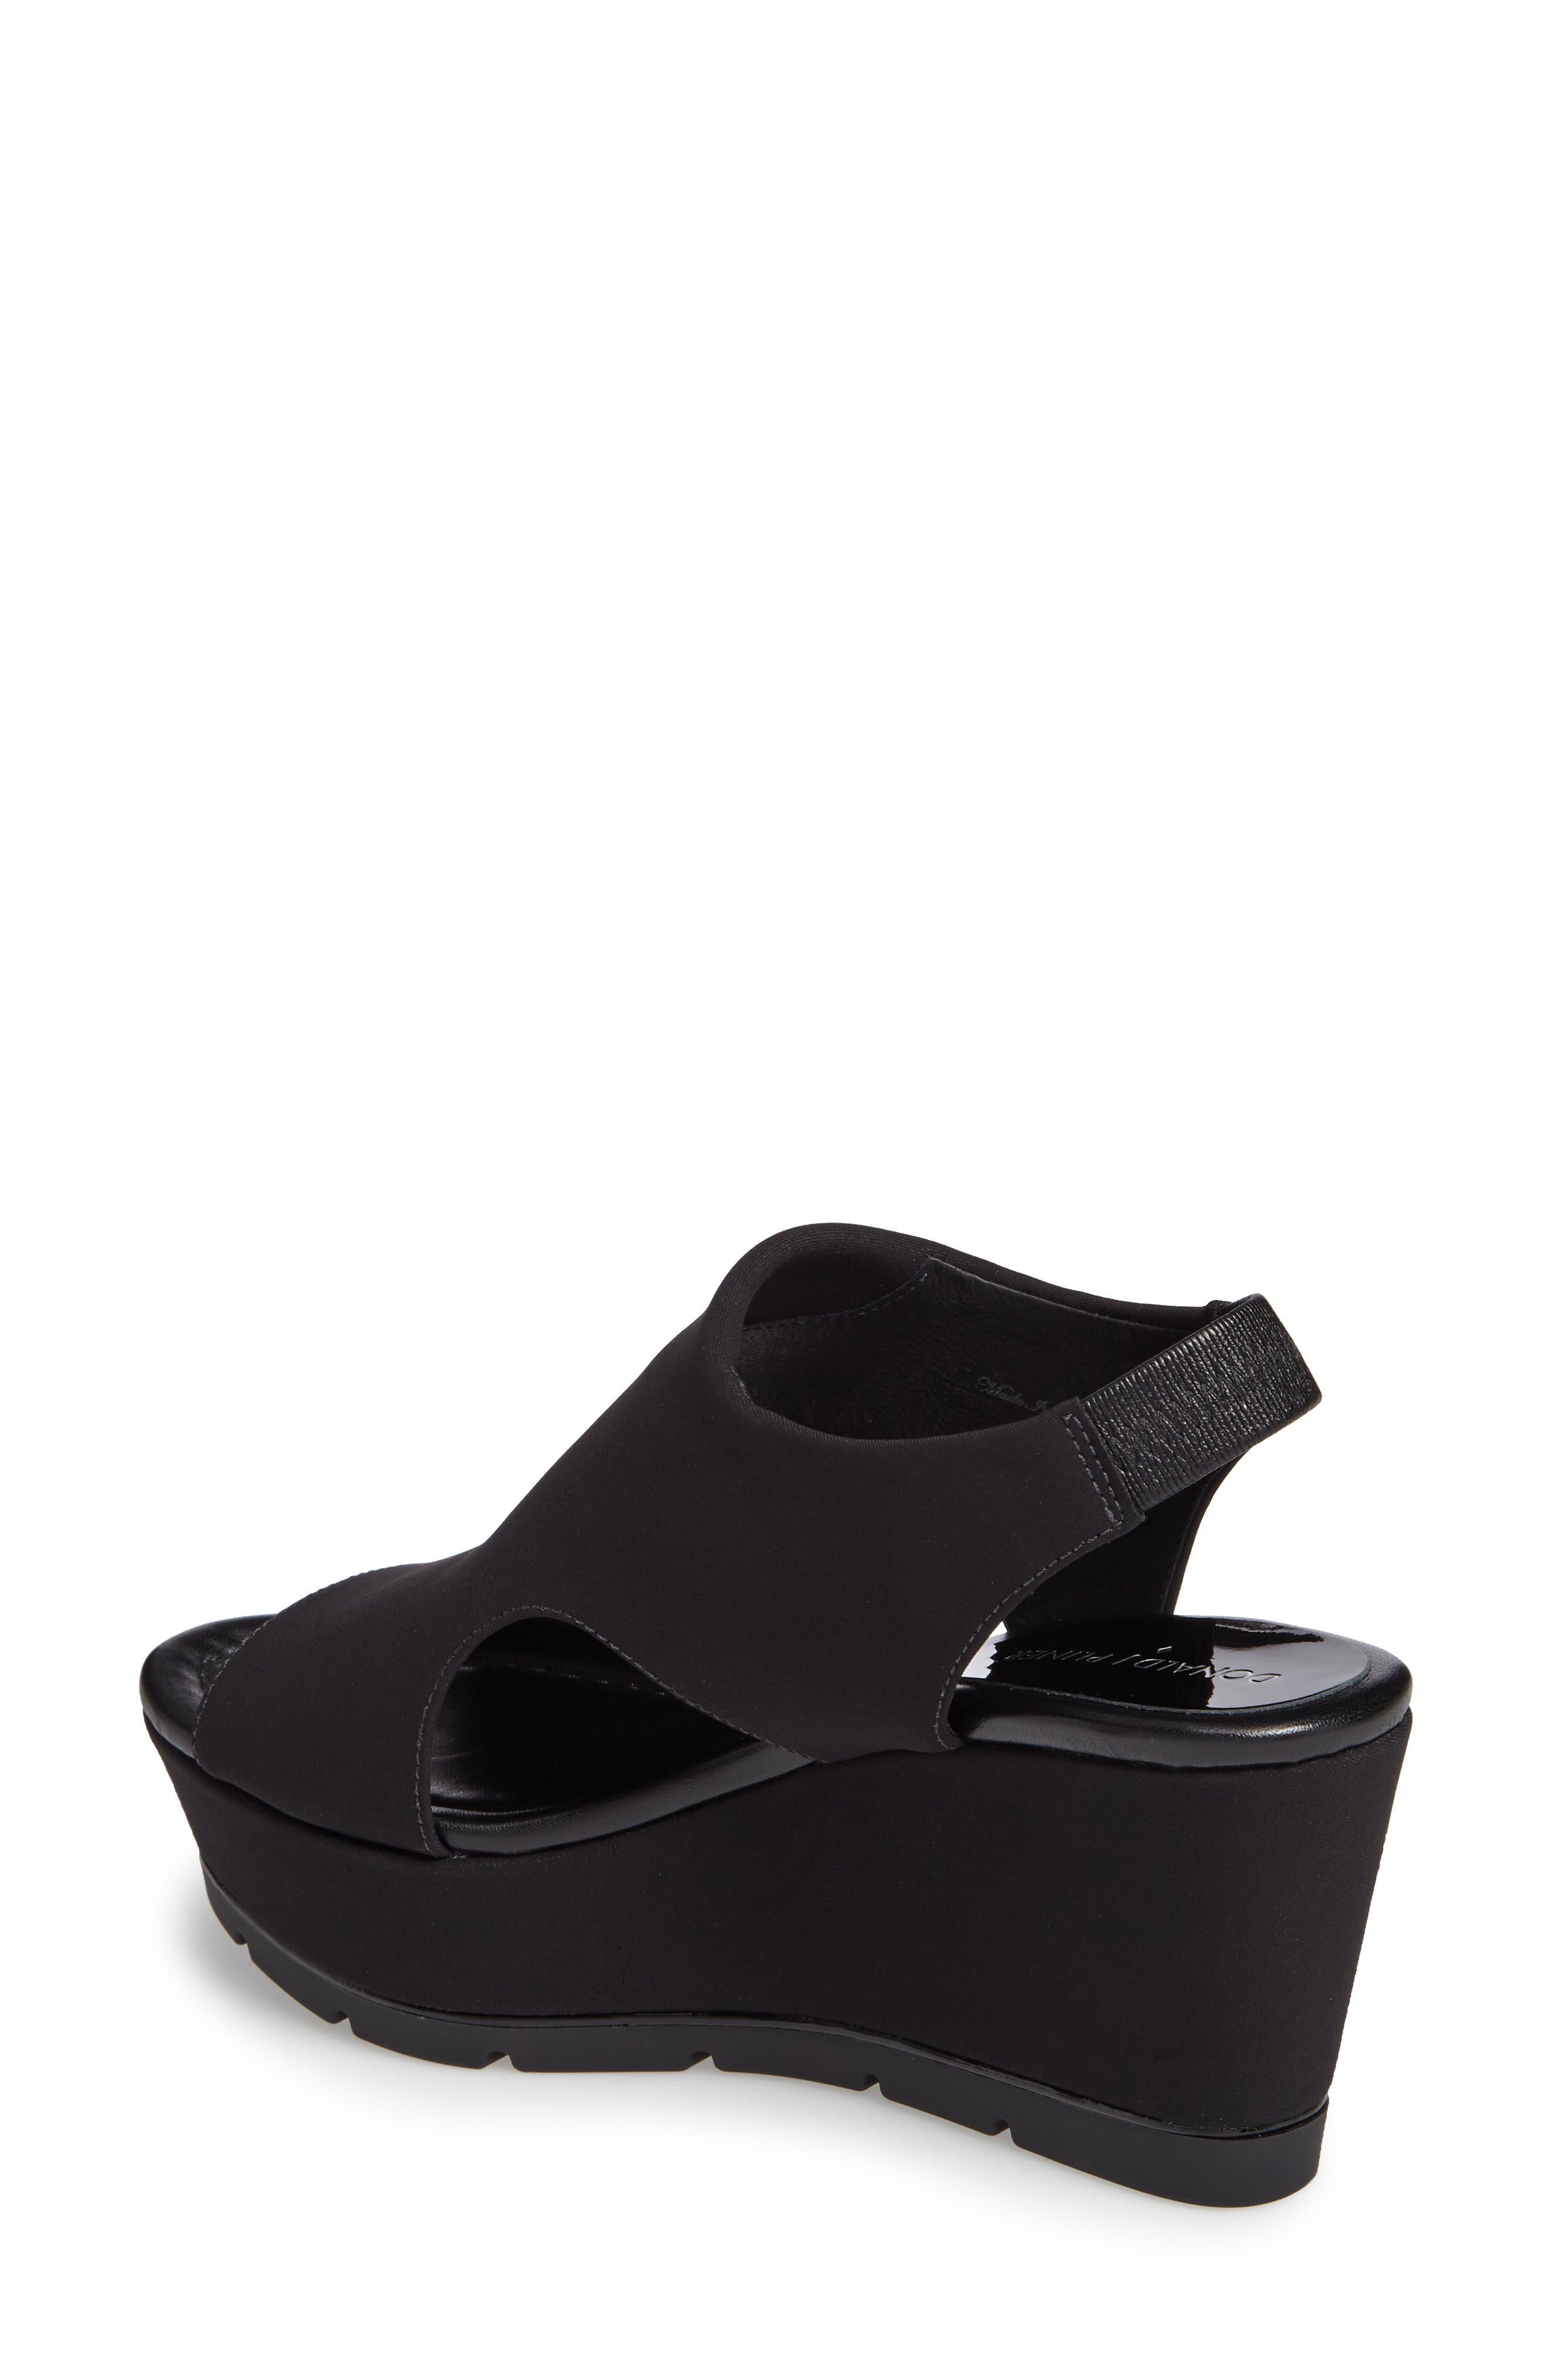 Donald J Pliner Fonda Platform Wedge Sandal,                             Alternate thumbnail 2, color,                             Black Crepe